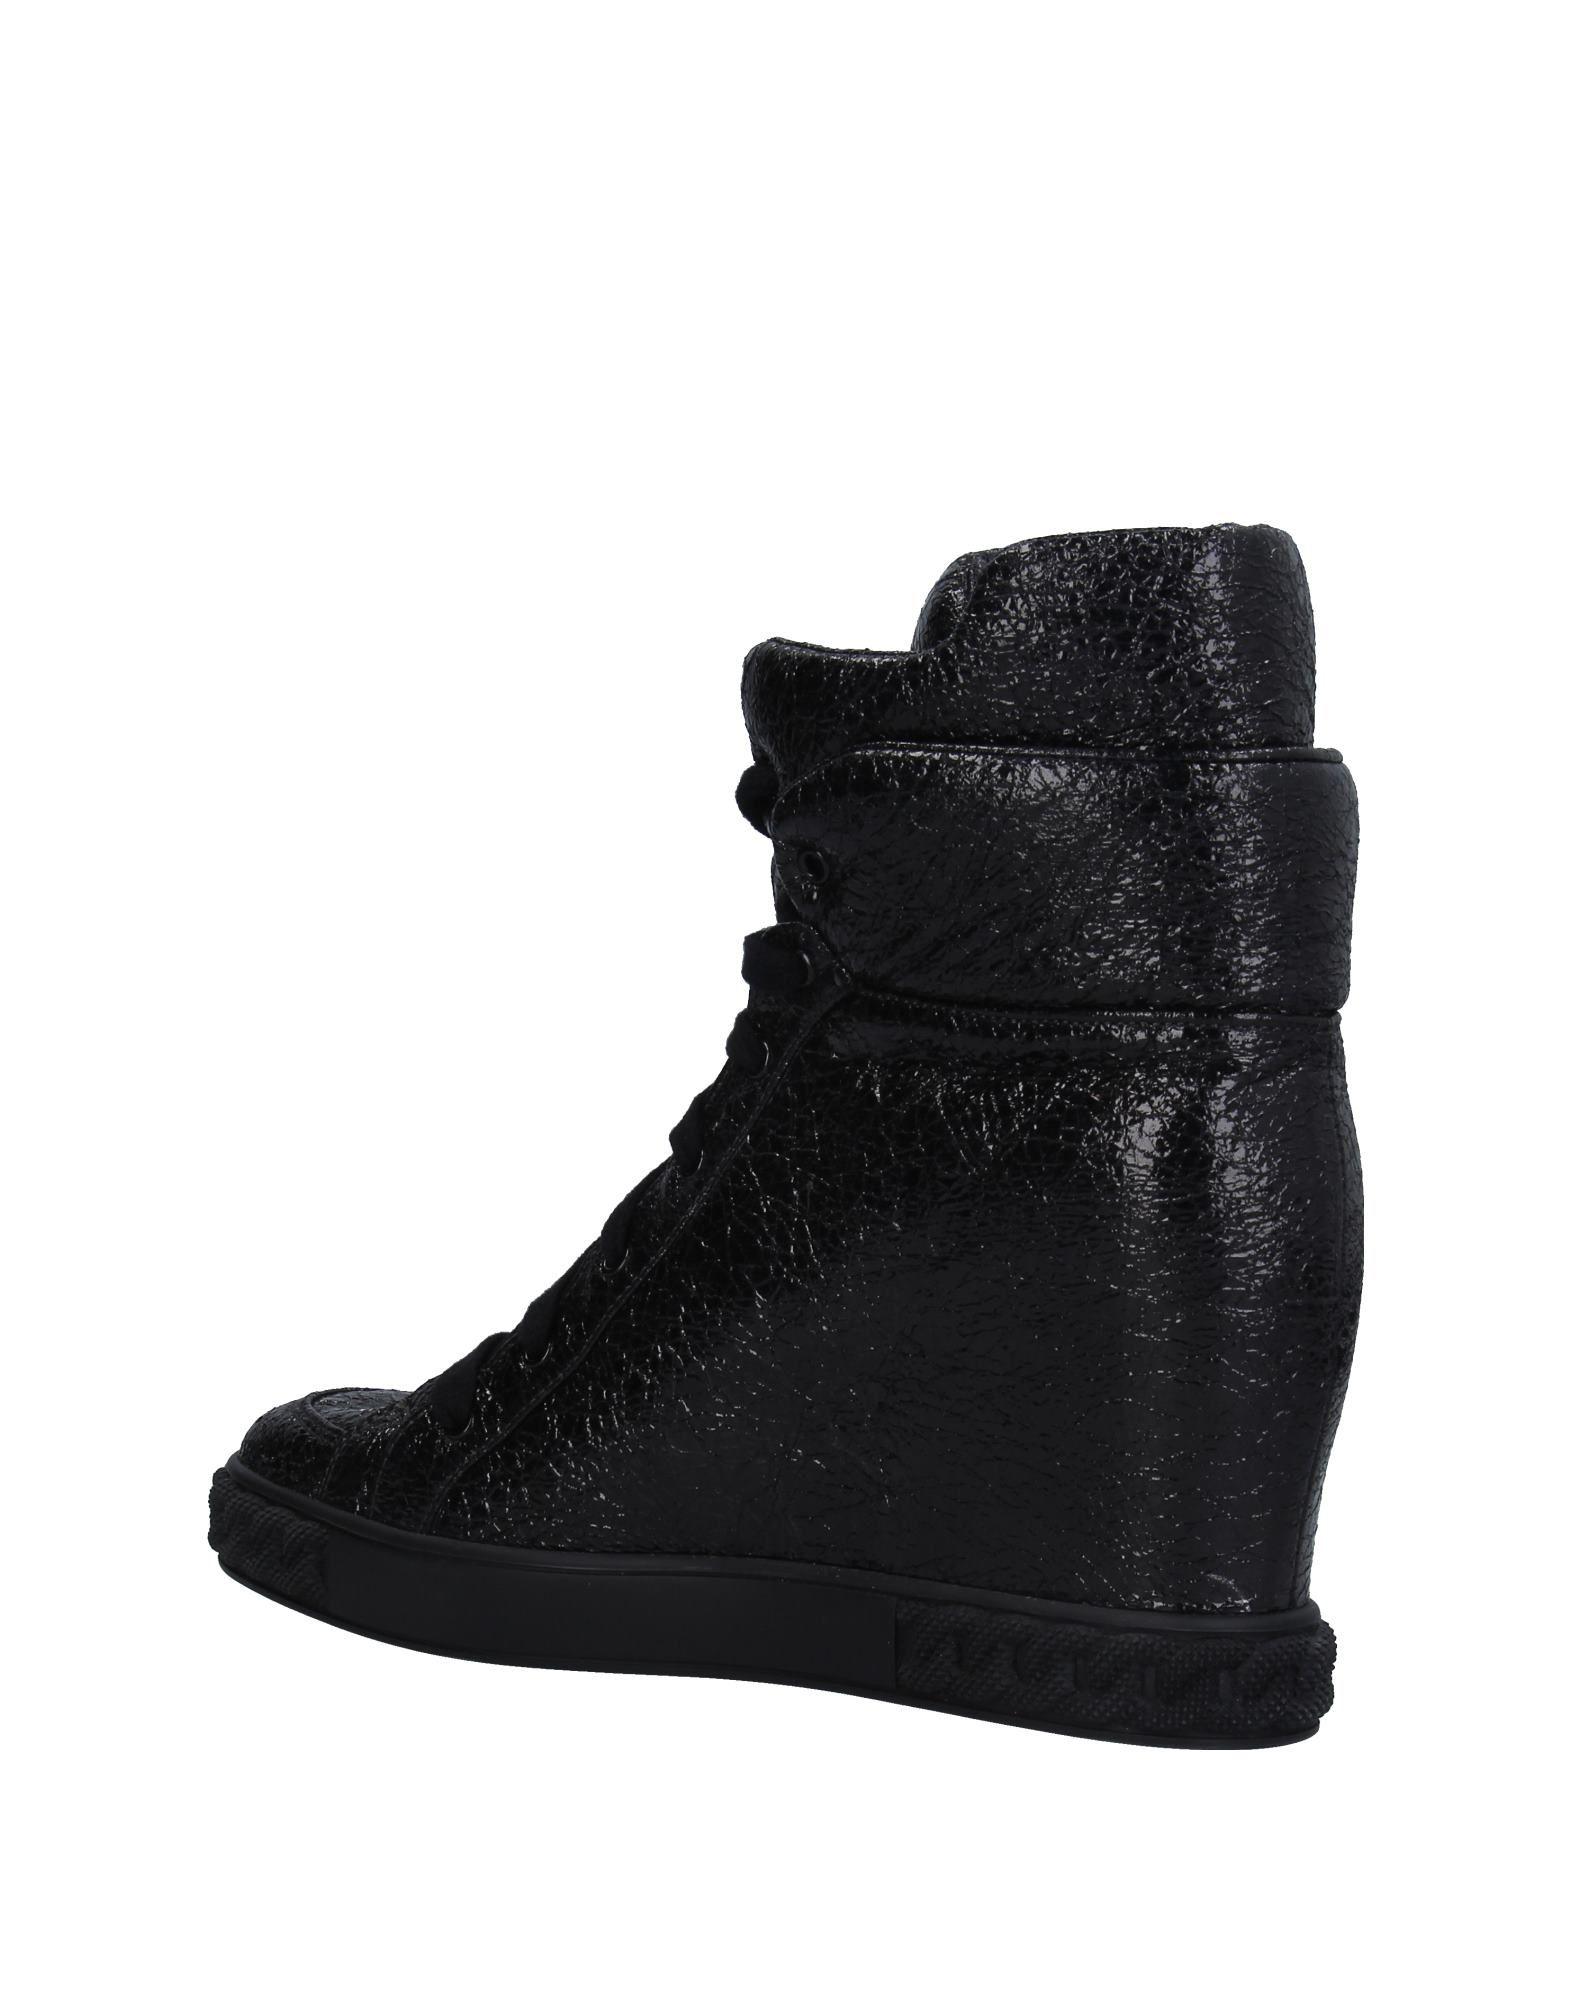 Casadei Sneakers Damen  11329449OQGut aussehende strapazierfähige Schuhe